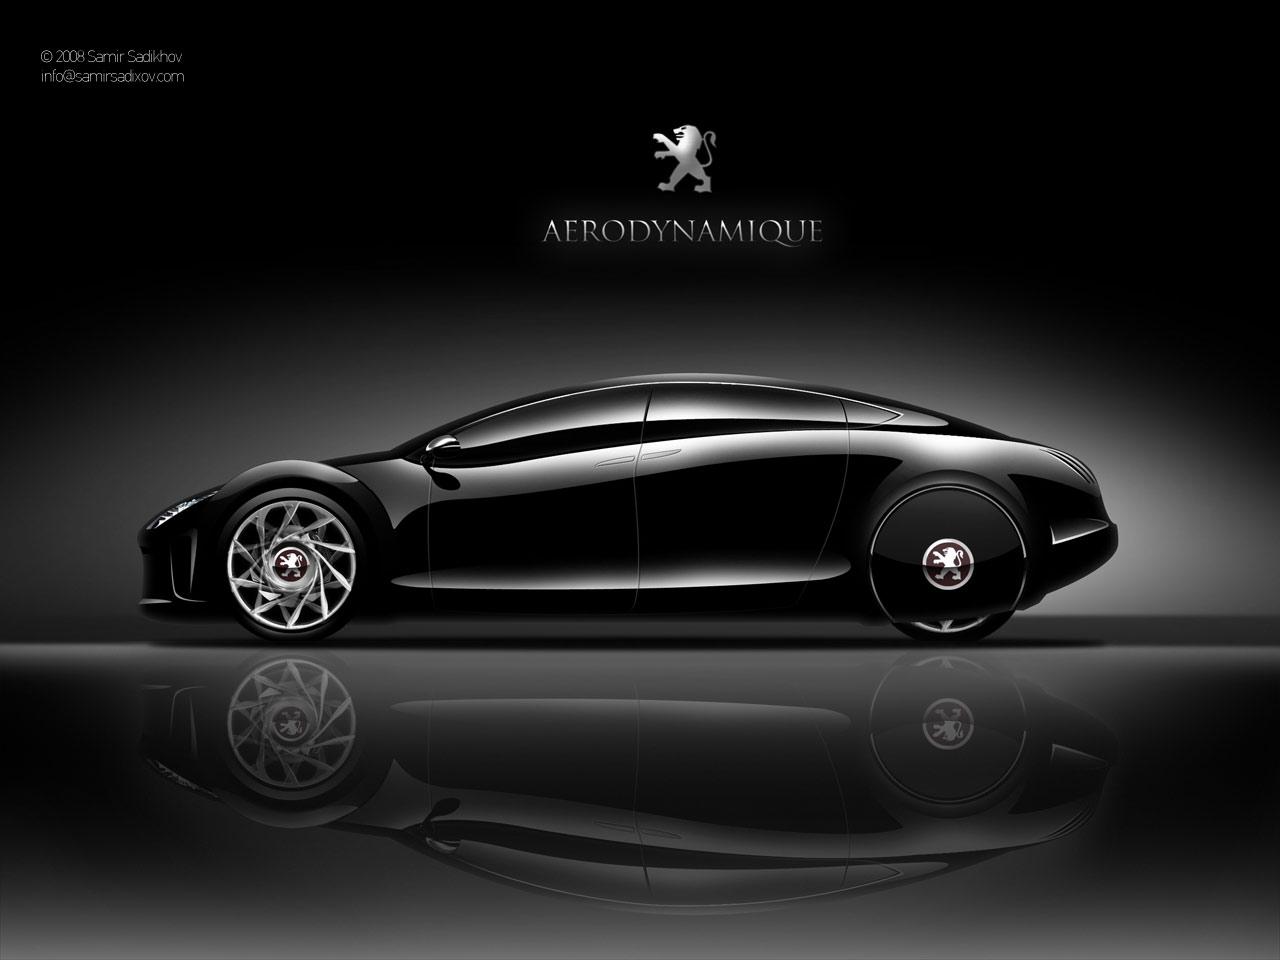 Peugeot Aerodynamique by Samirs